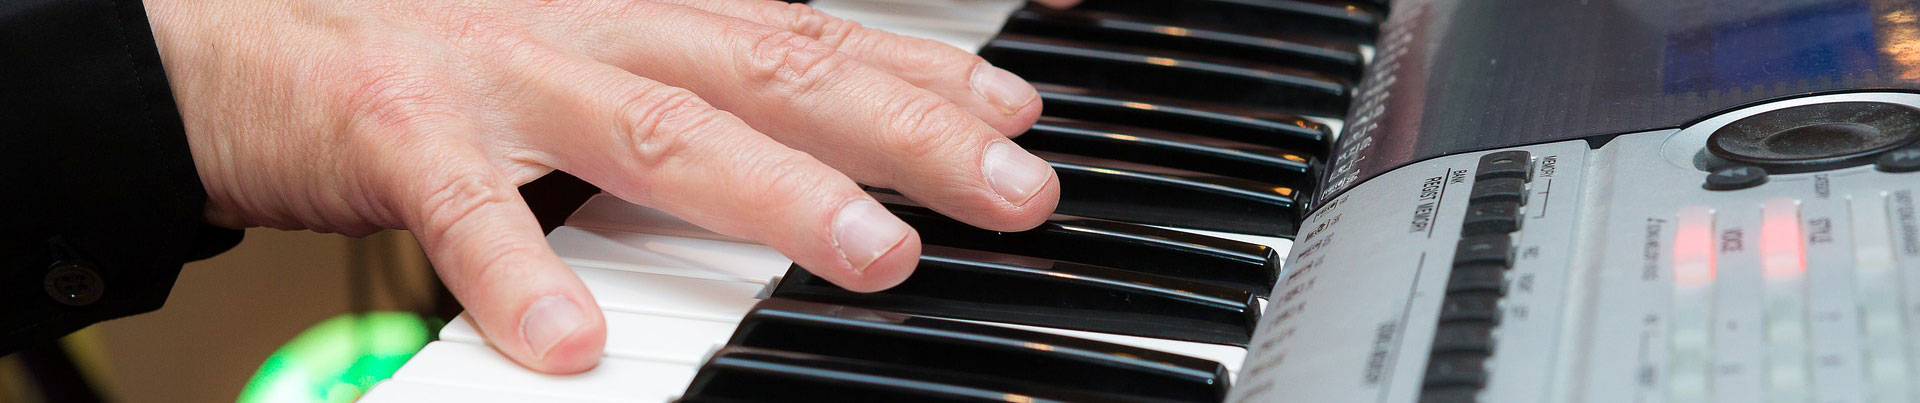 anslag-piano-köpa-keyboard